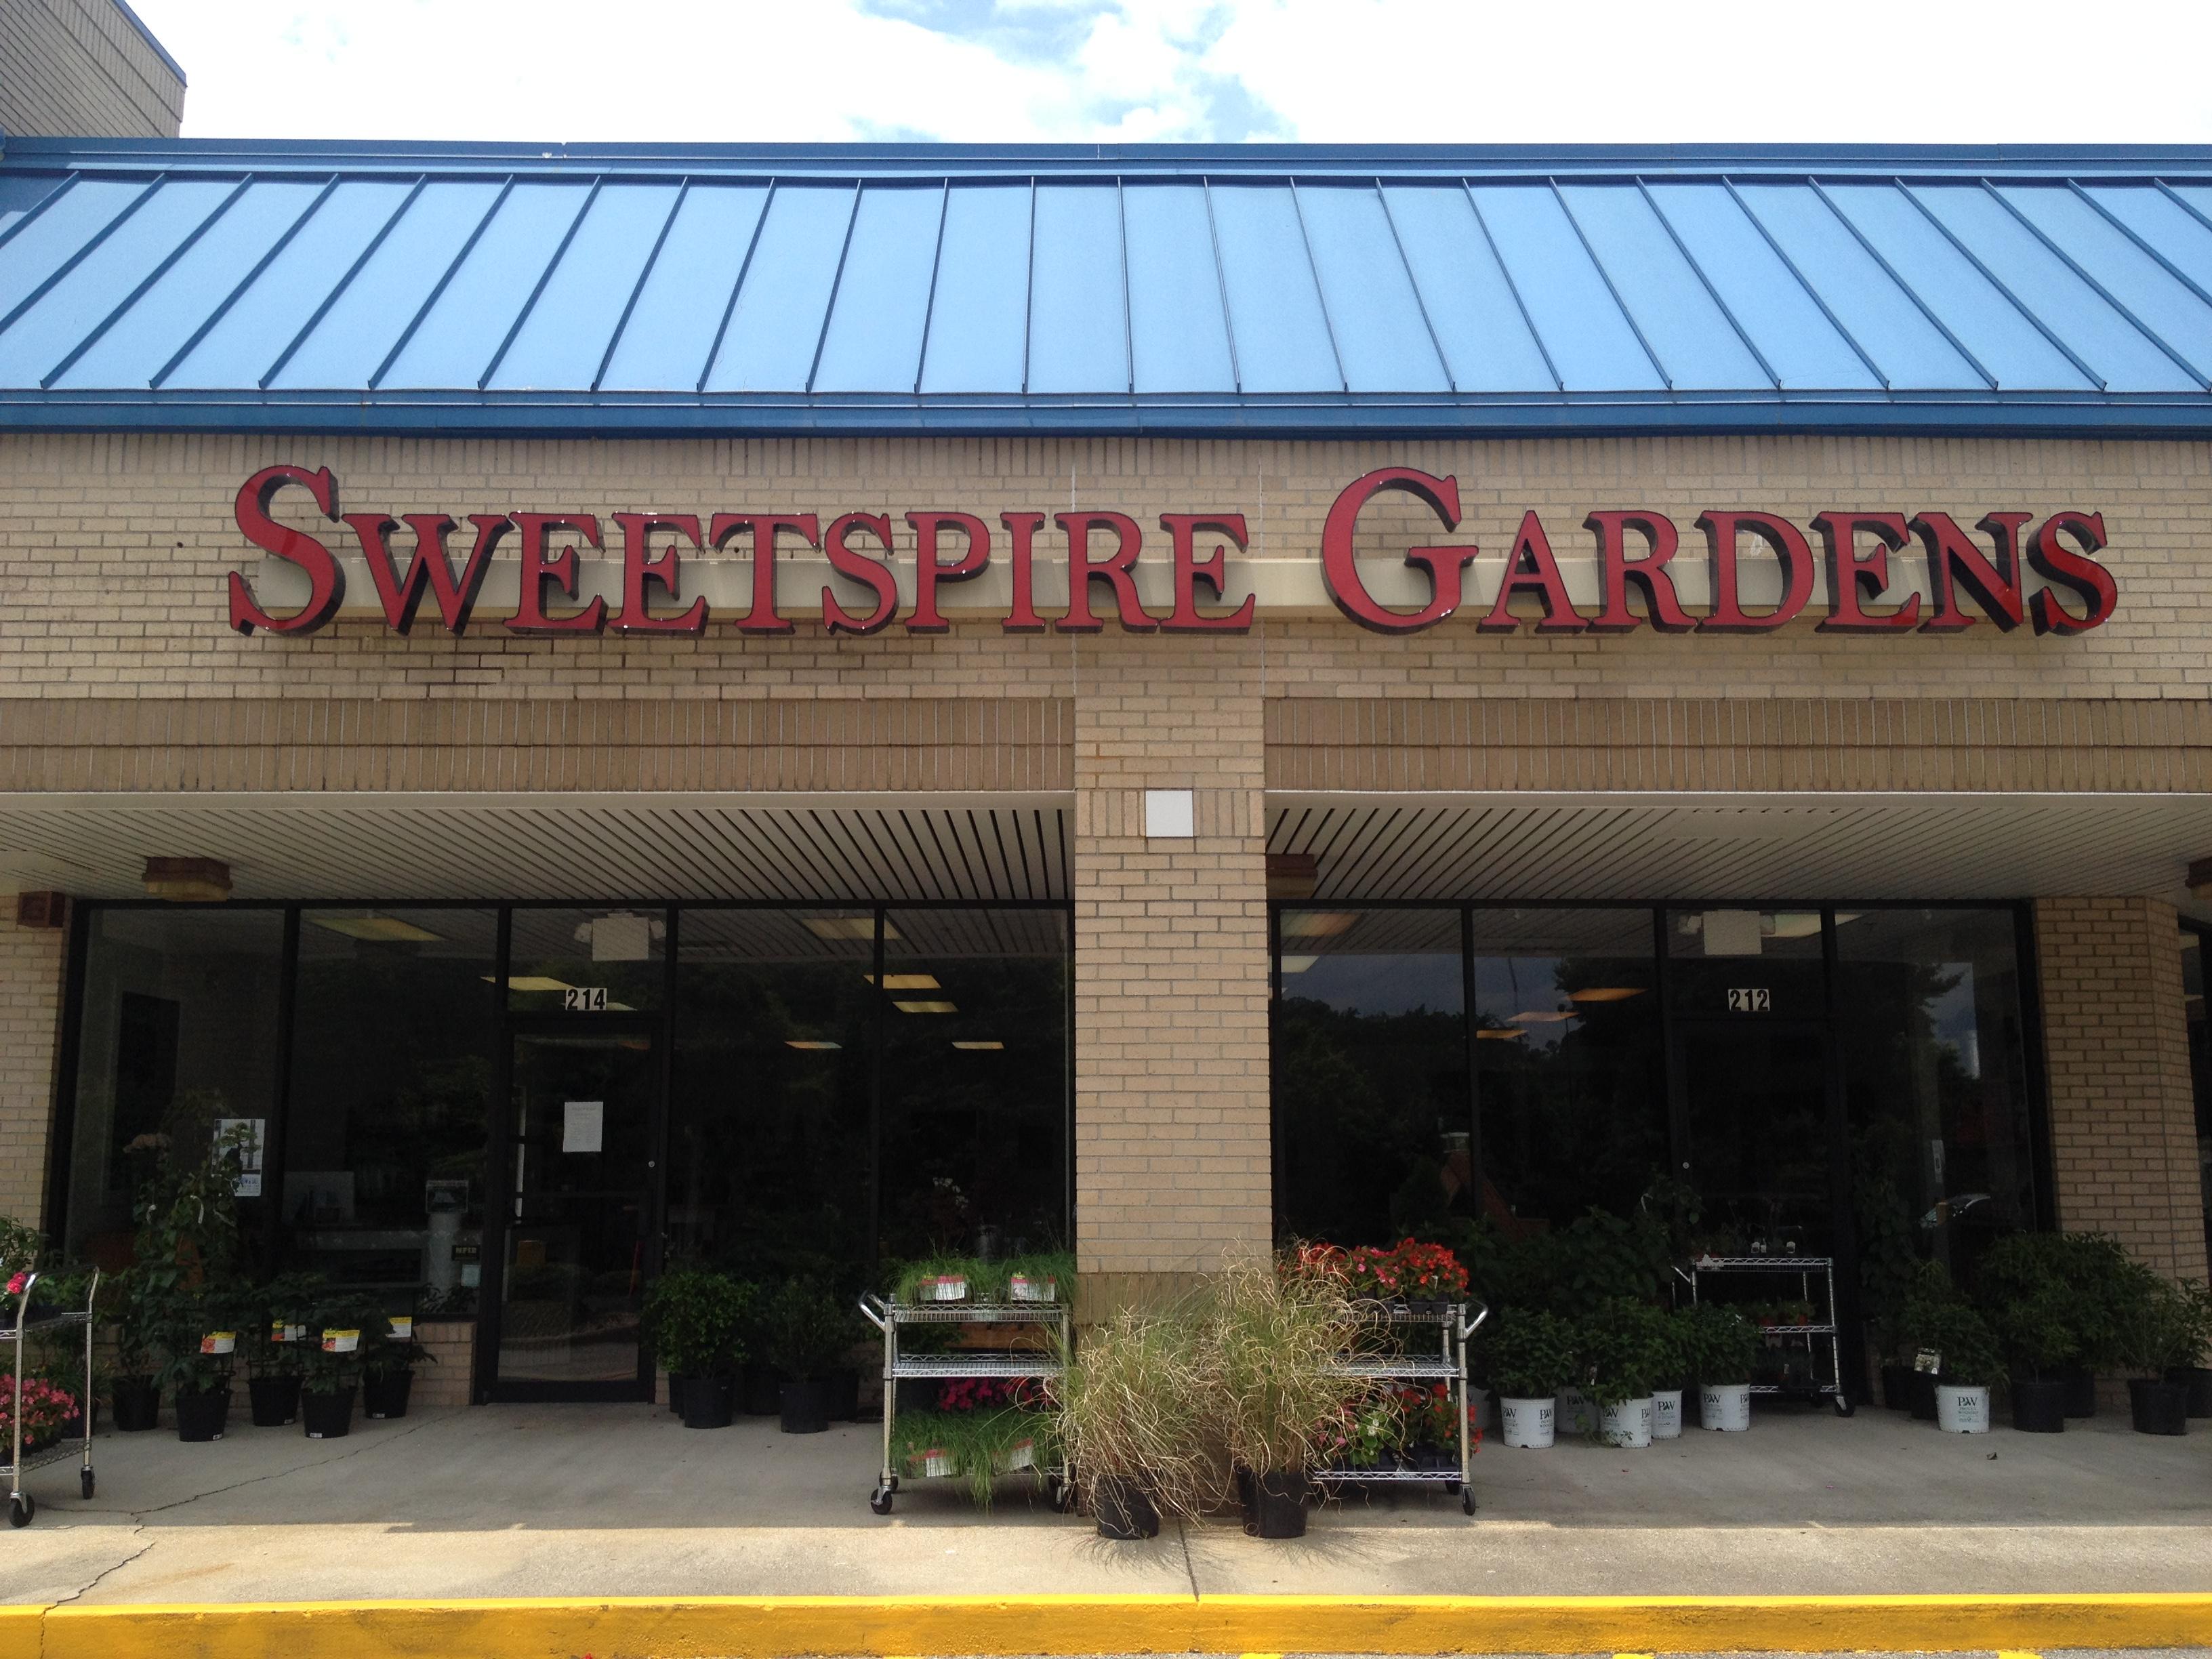 Sweetspire Gardens image 1